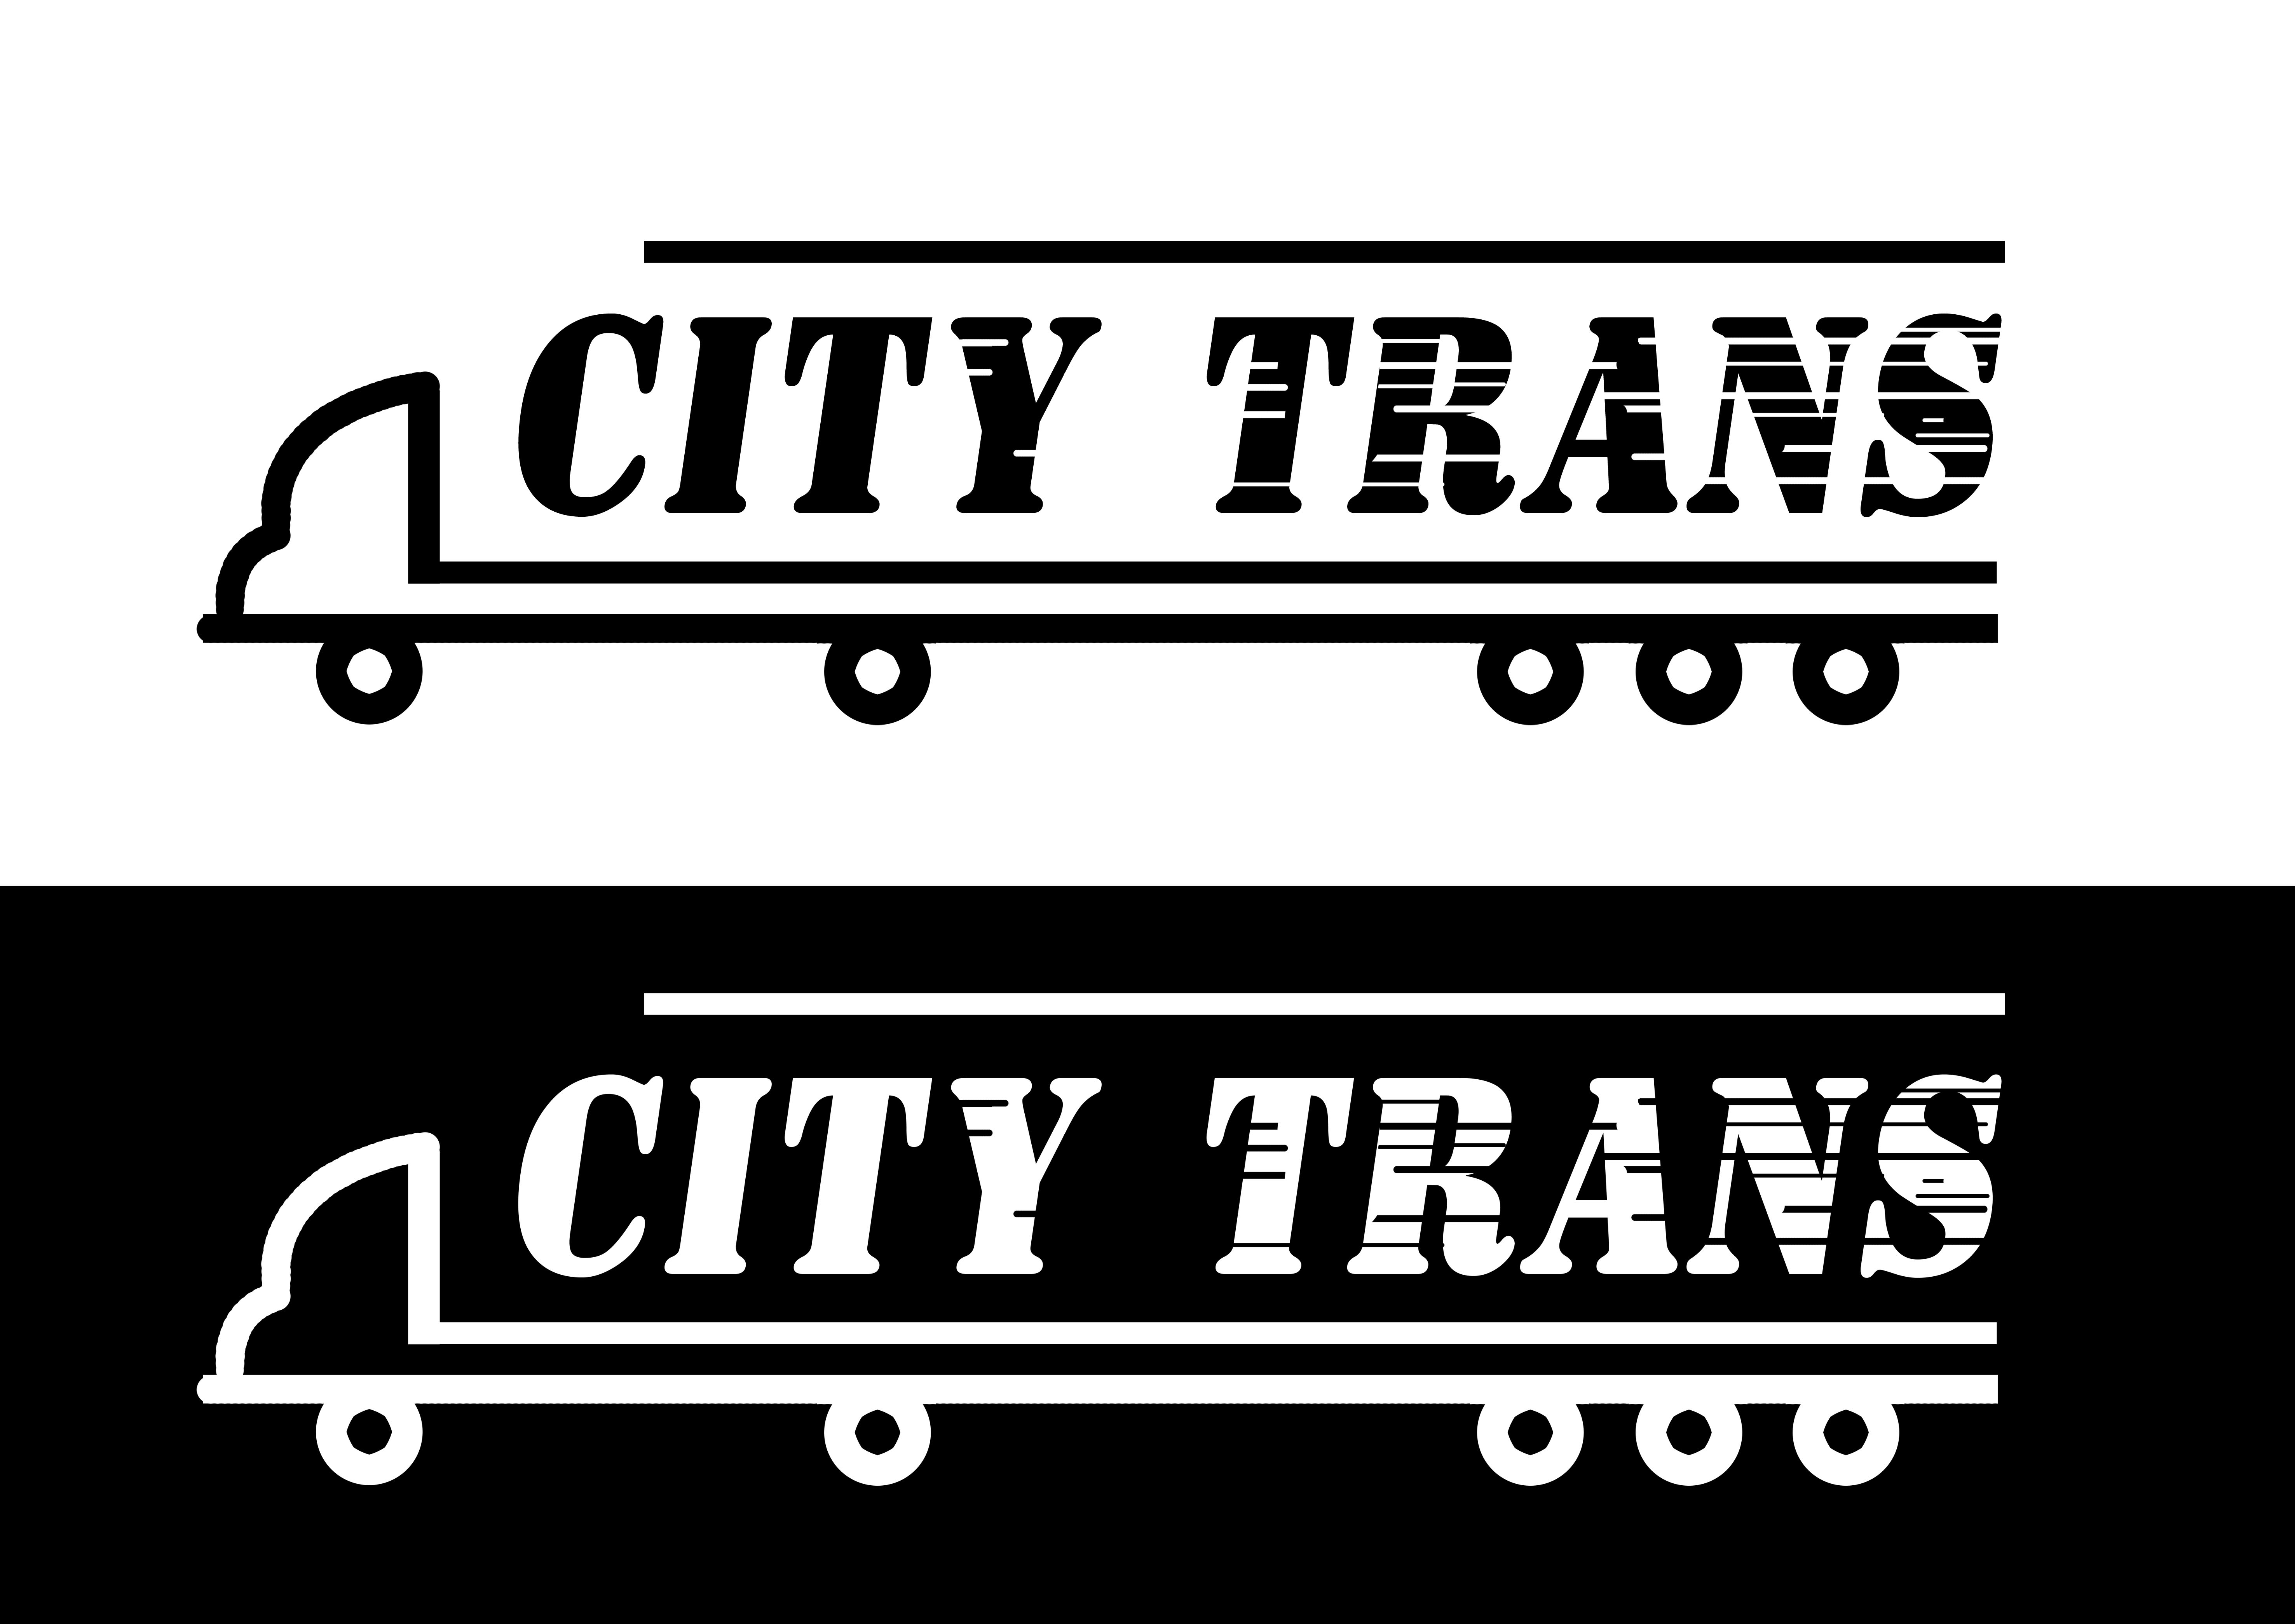 Разработка Логотипа транспортной компании фото f_4945e70a103b3df4.jpg